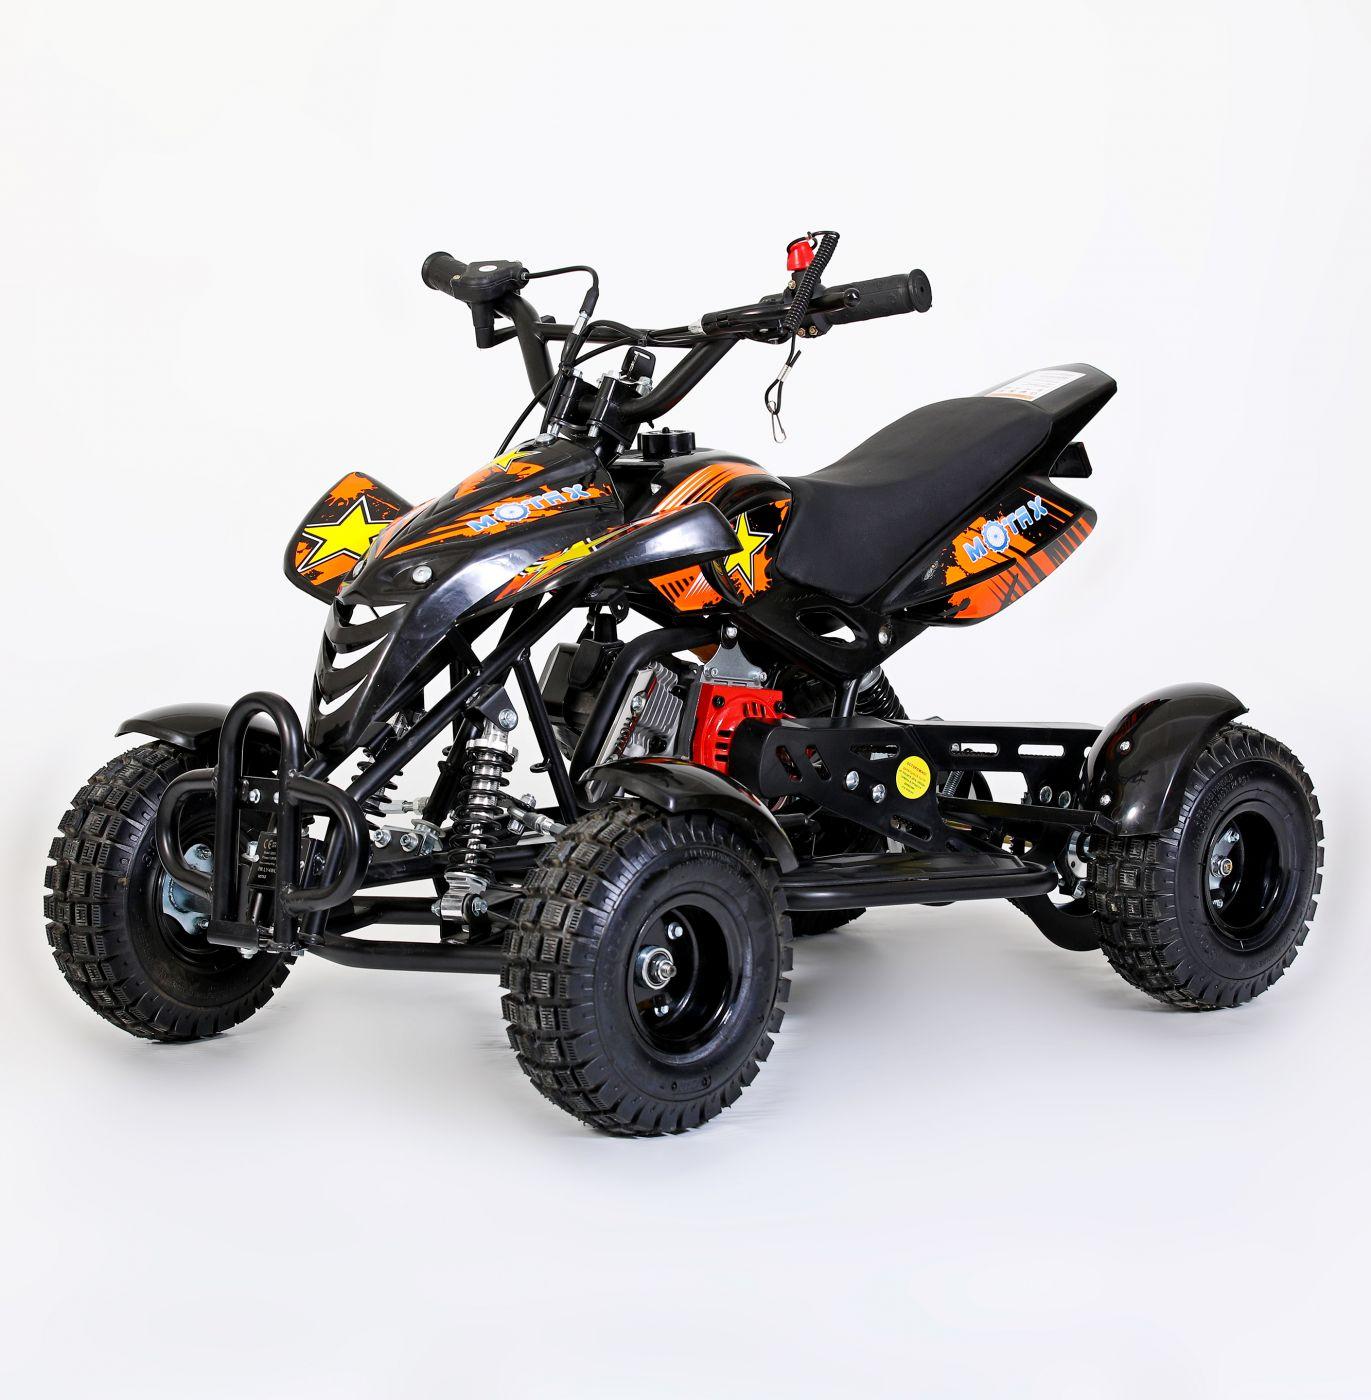 MOTAX H4 Mini 49 сс Квадроцикл бензиновый